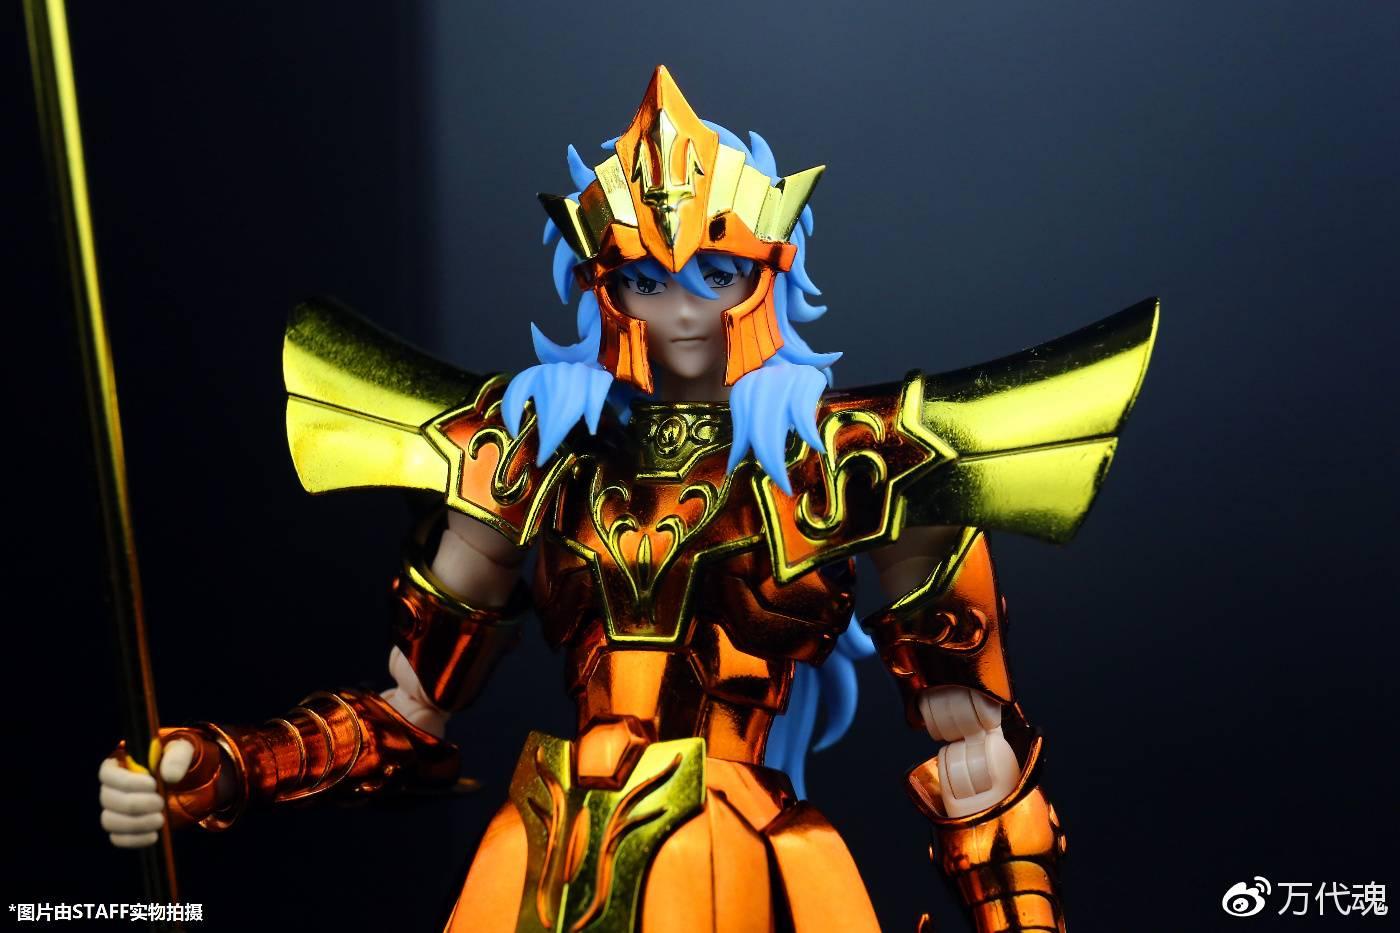 [Comentários] Saint Cloth Myth EX - Poseidon EX & Poseidon EX Imperial Throne Set - Página 2 018PUEk3_o